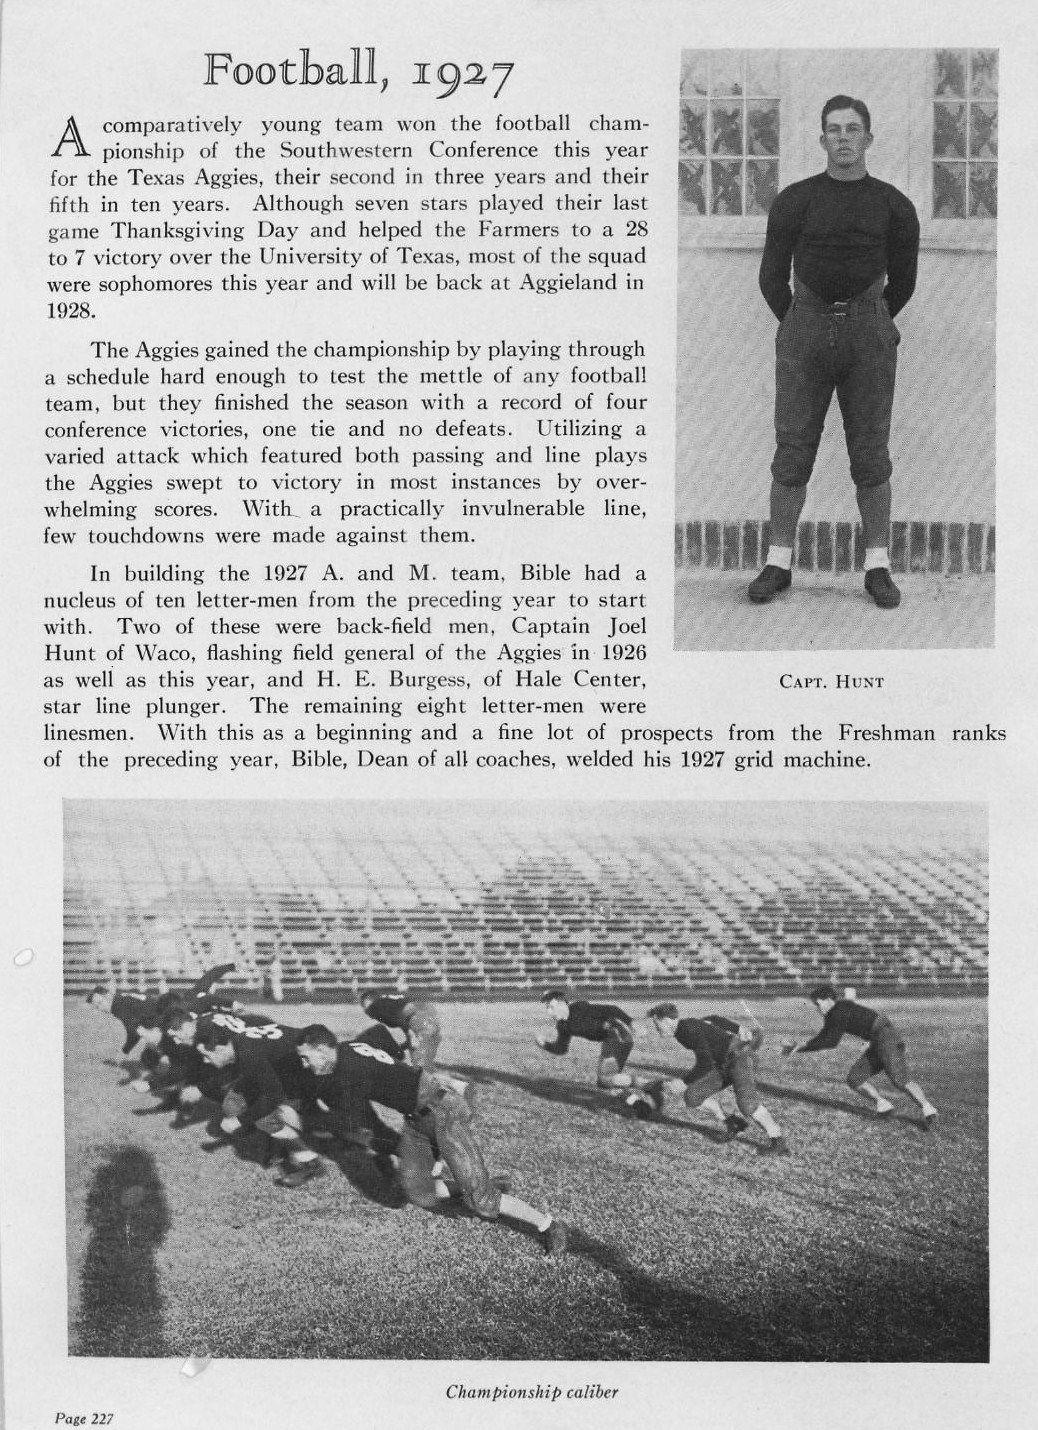 1927 Texas A & M Aggies Football Outlook on the team